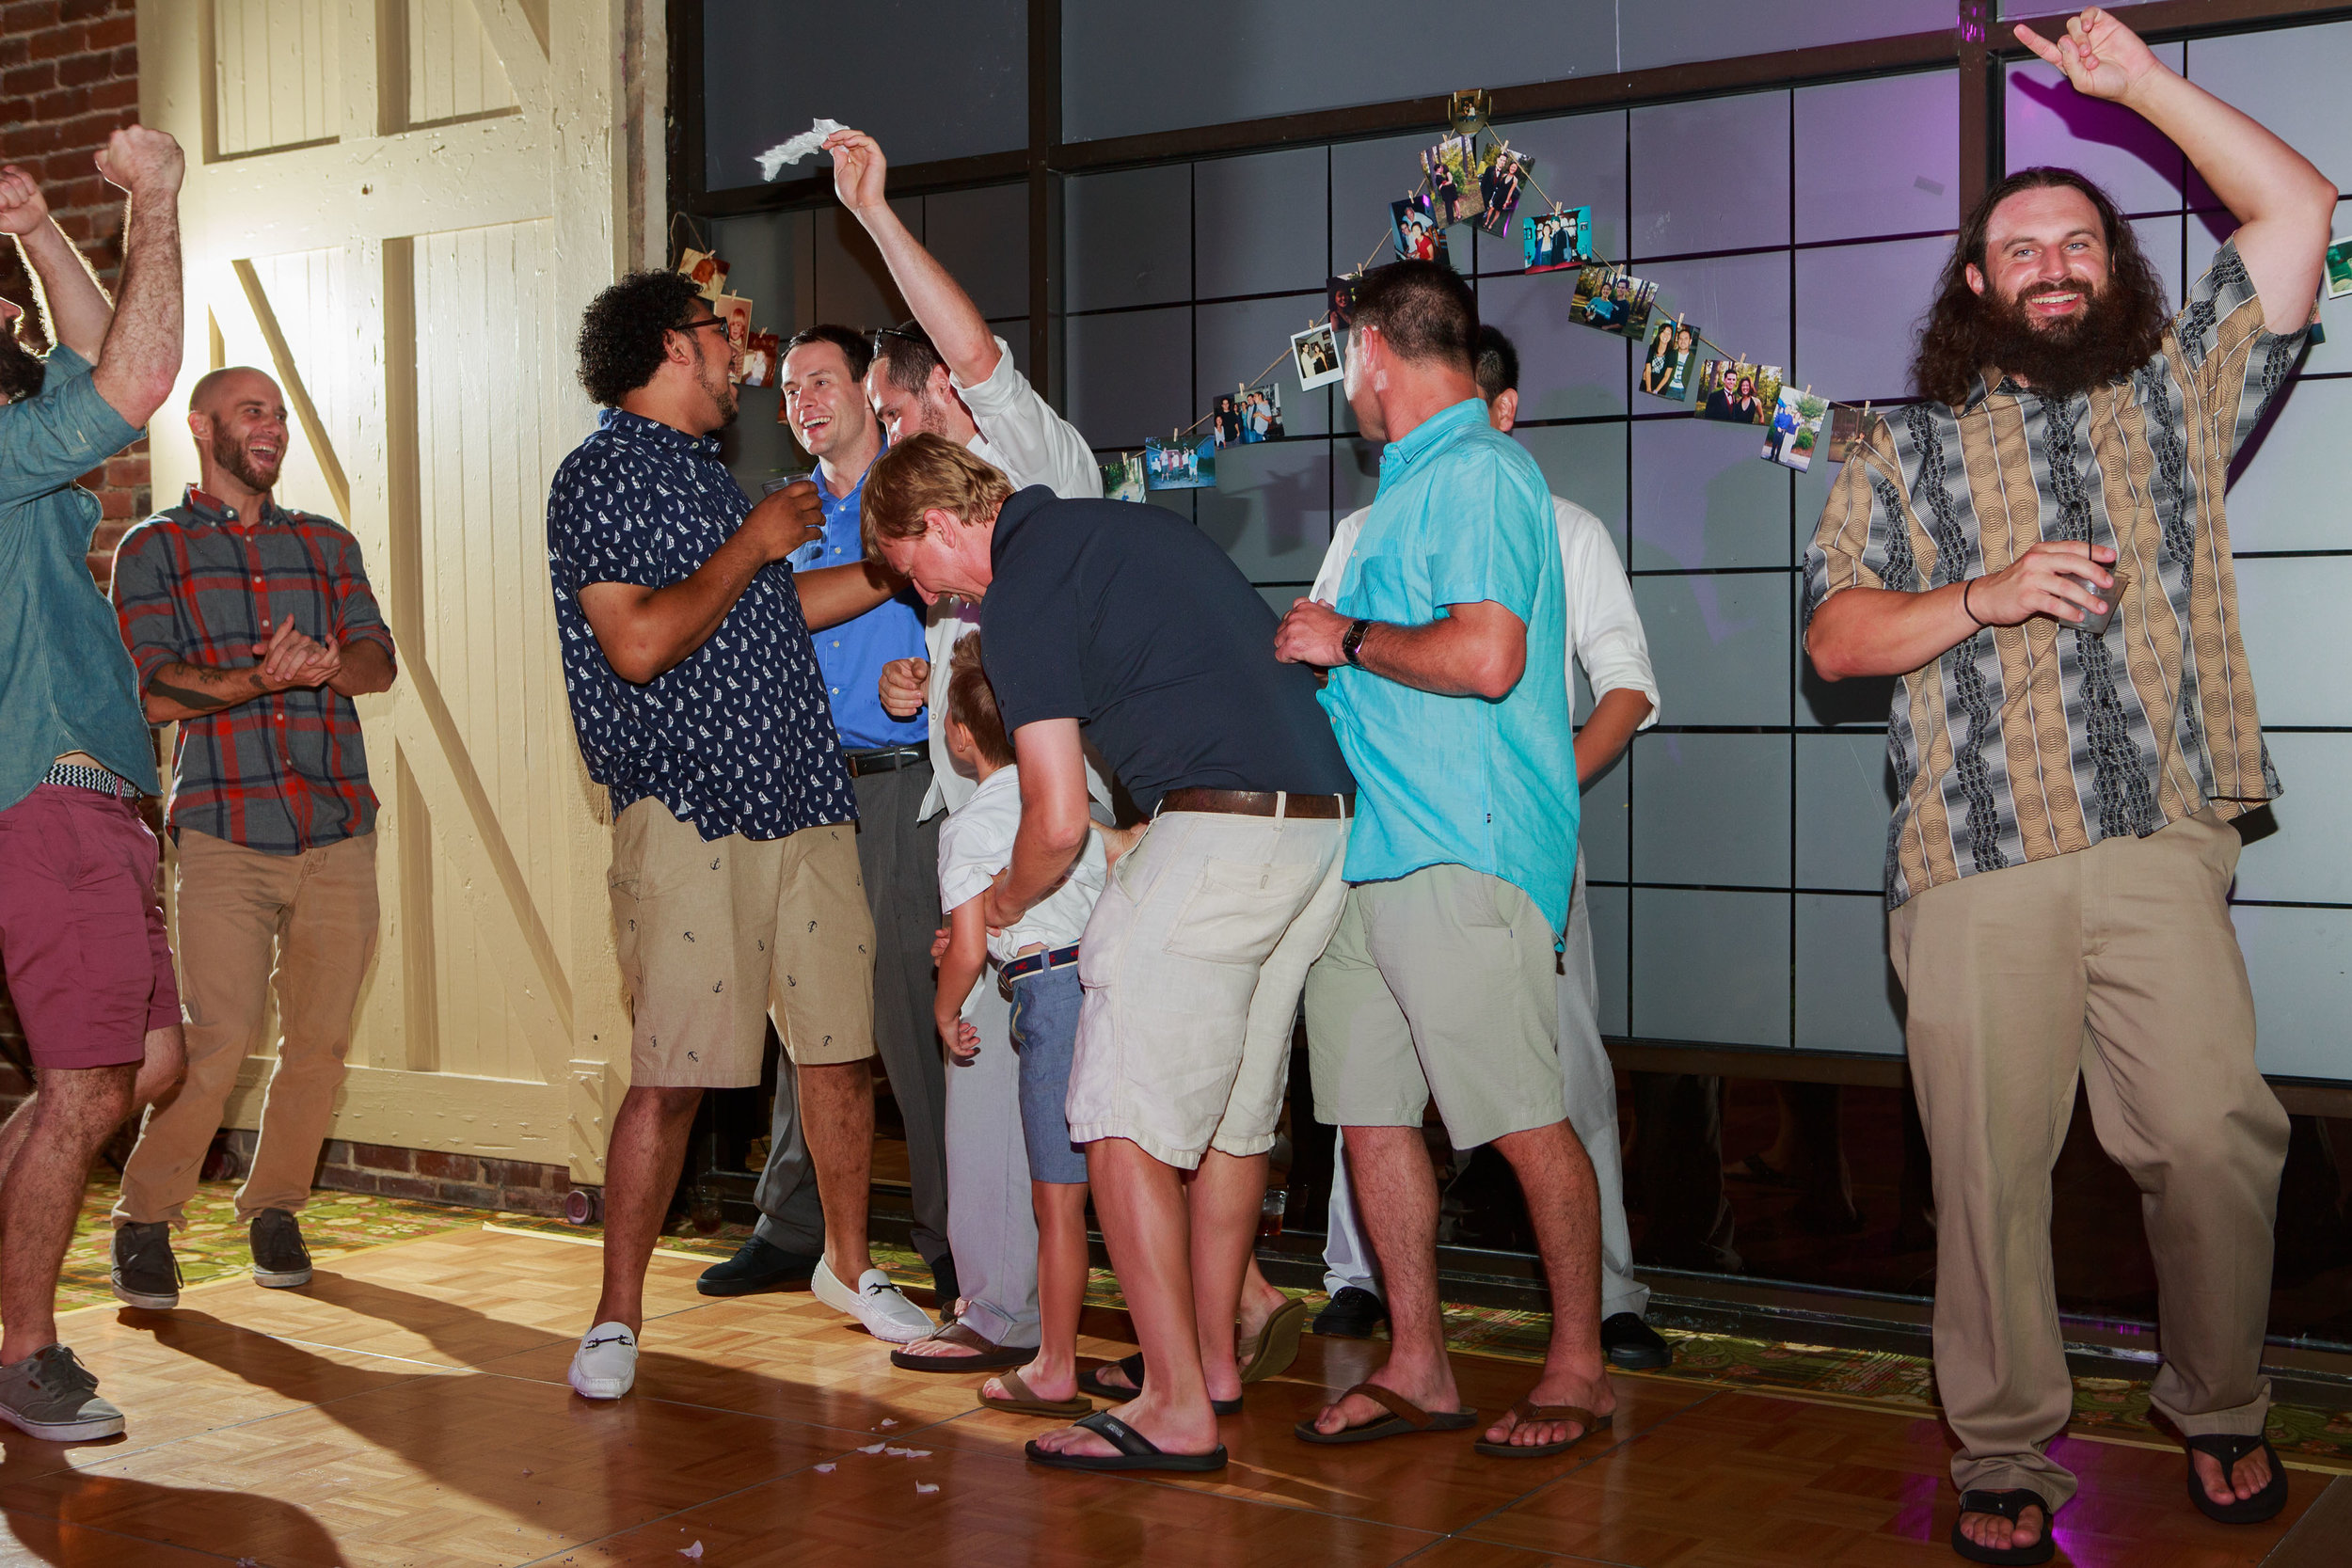 North_Carolina_Wedding_Photographer_Tiffany_Abruzzo_Reception_299.jpg